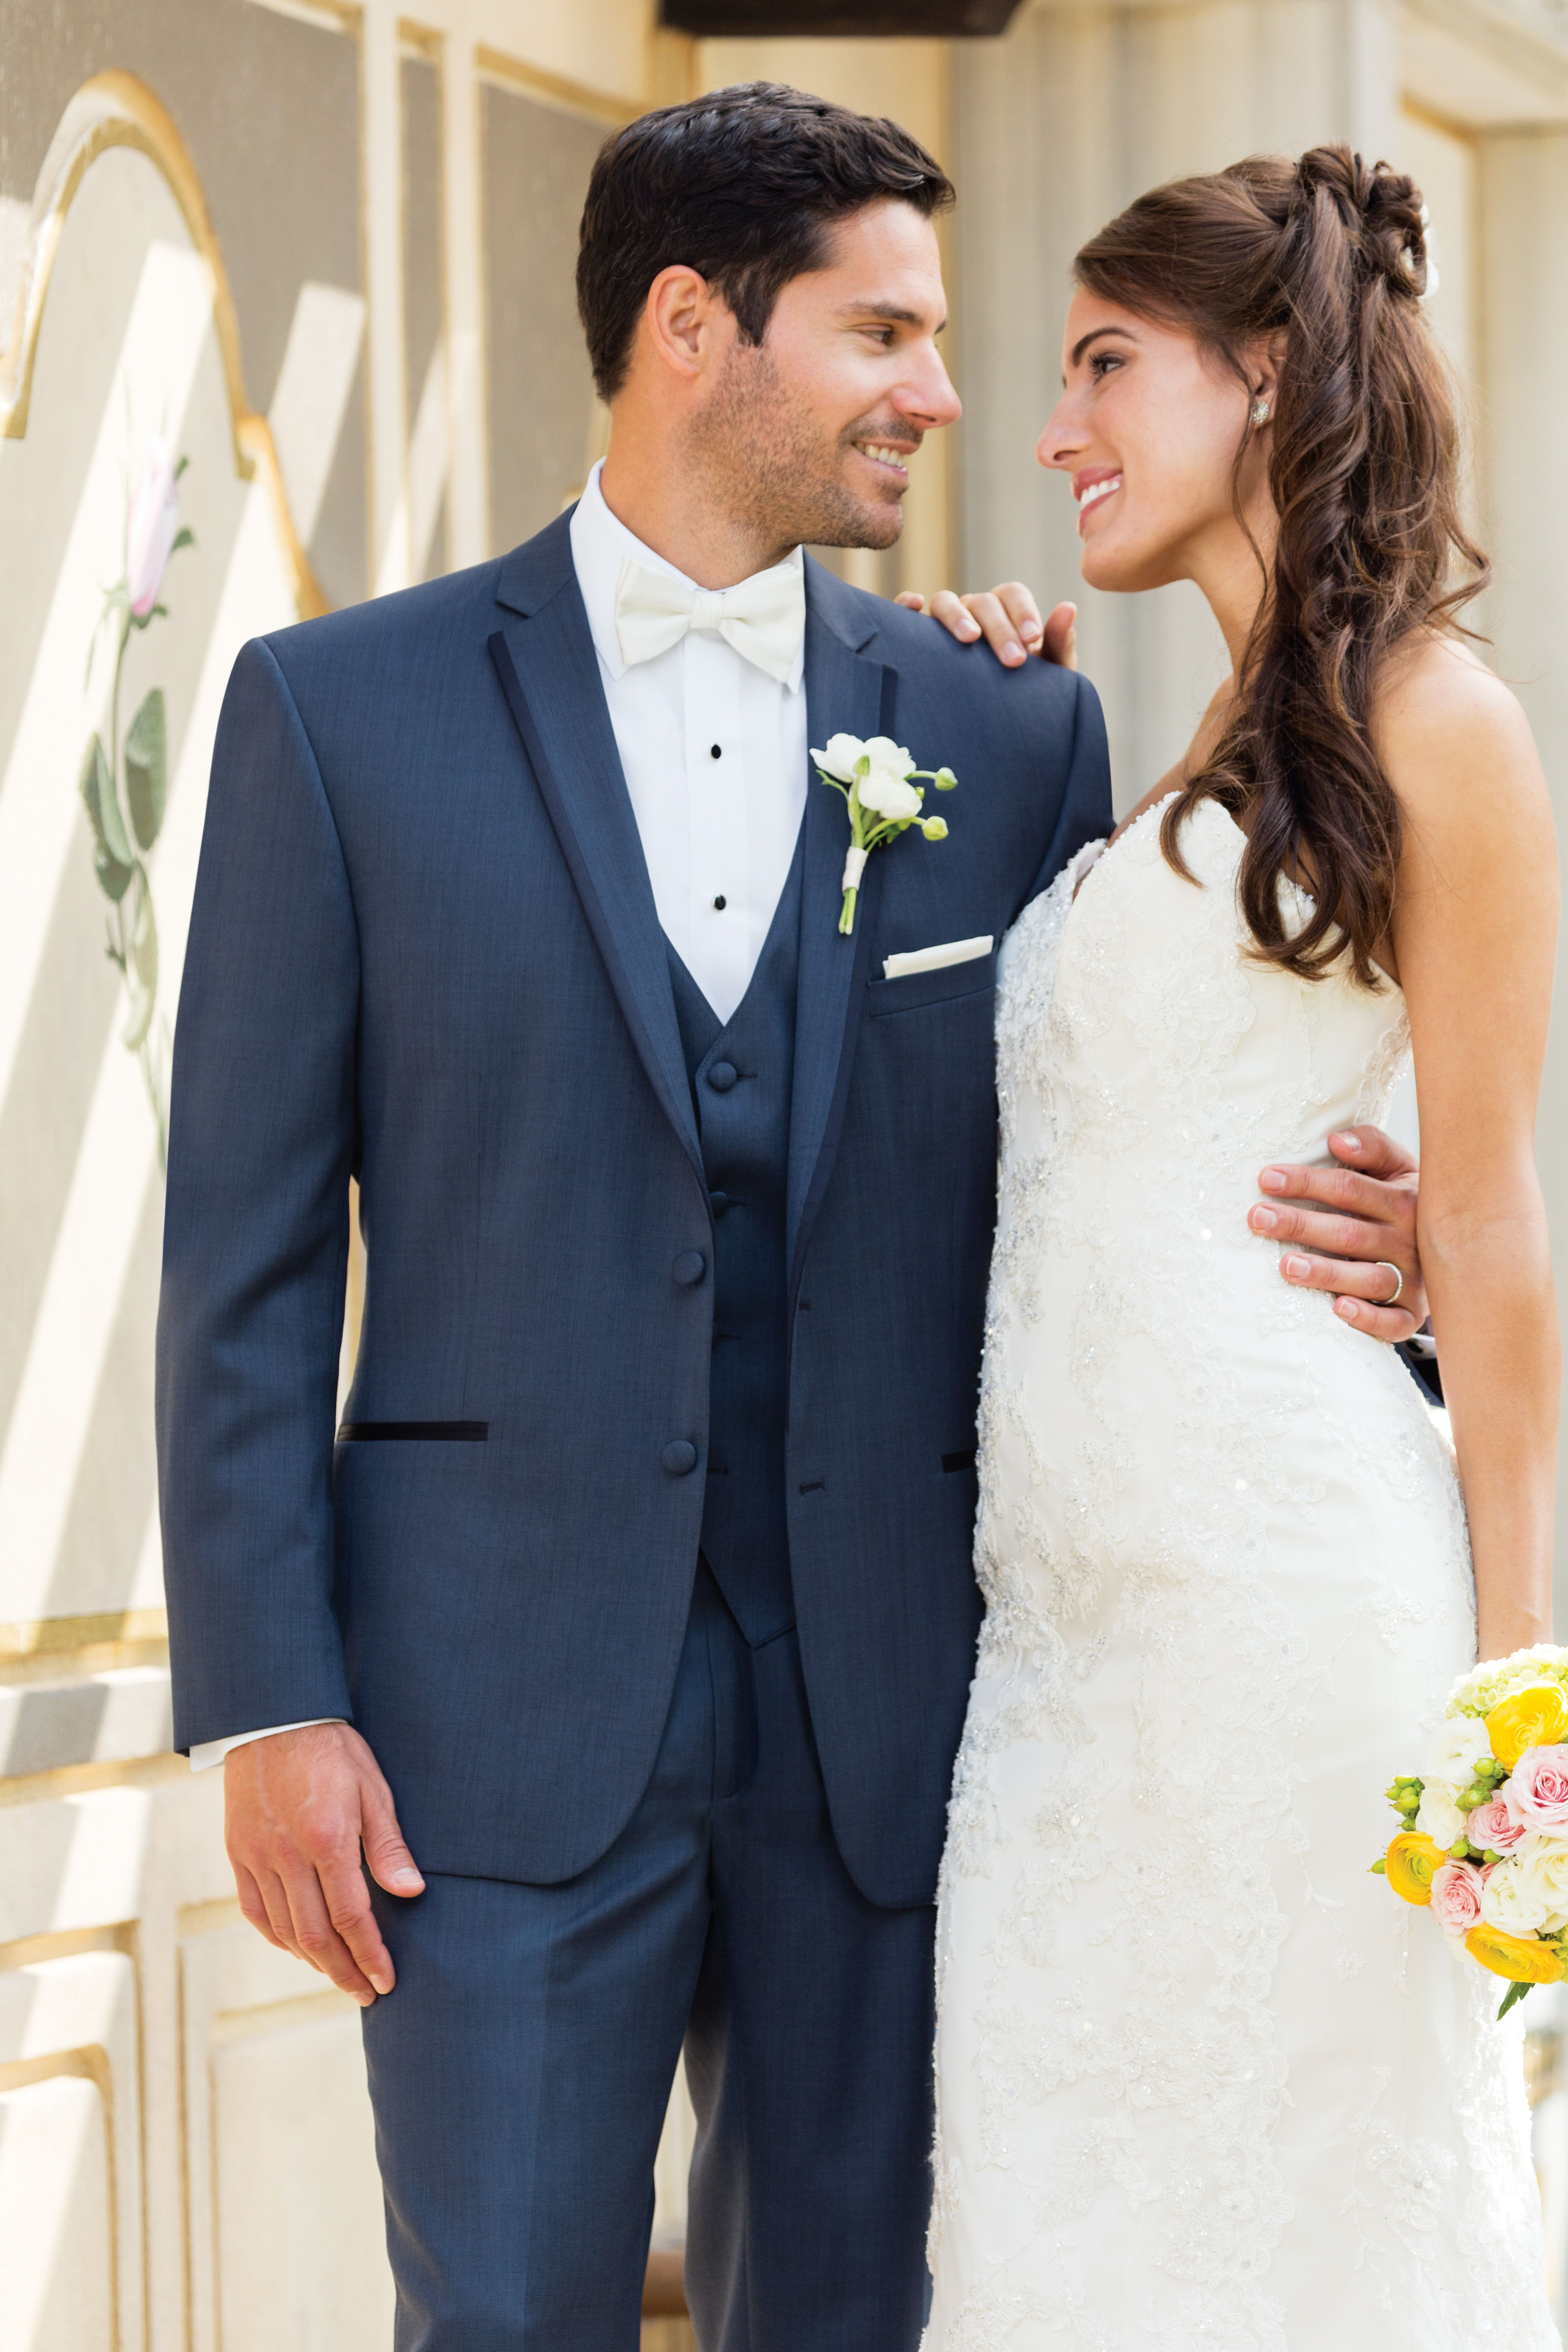 Giorgio Men\'s Warehouse   Warehouse, Tuxedo suit and Weddings